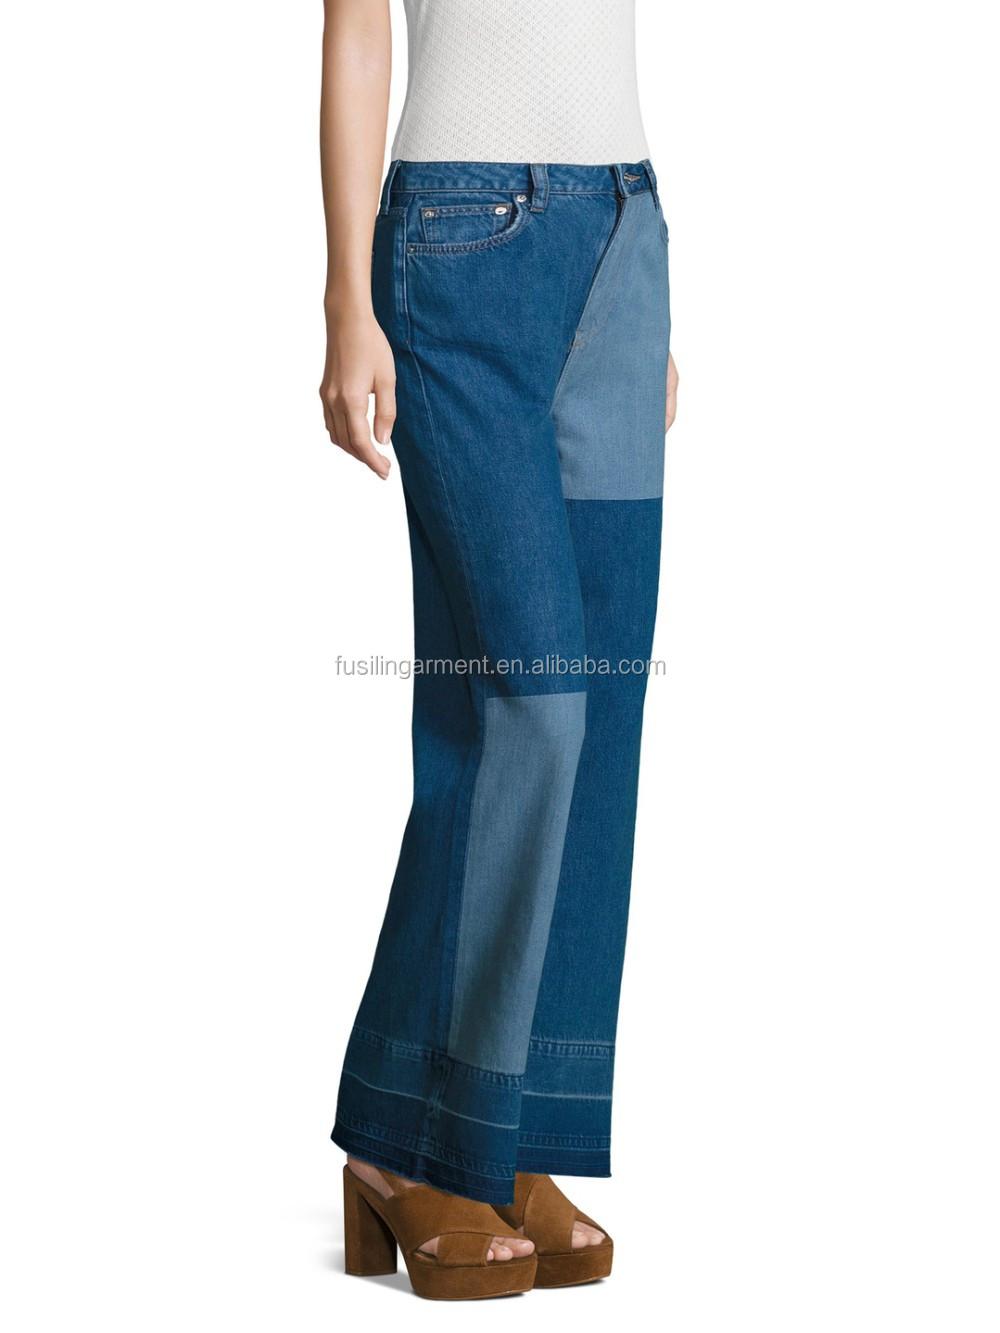 Wholesale Red Blue Denim Brand Jeans, Wholesale Red Blue Denim ...